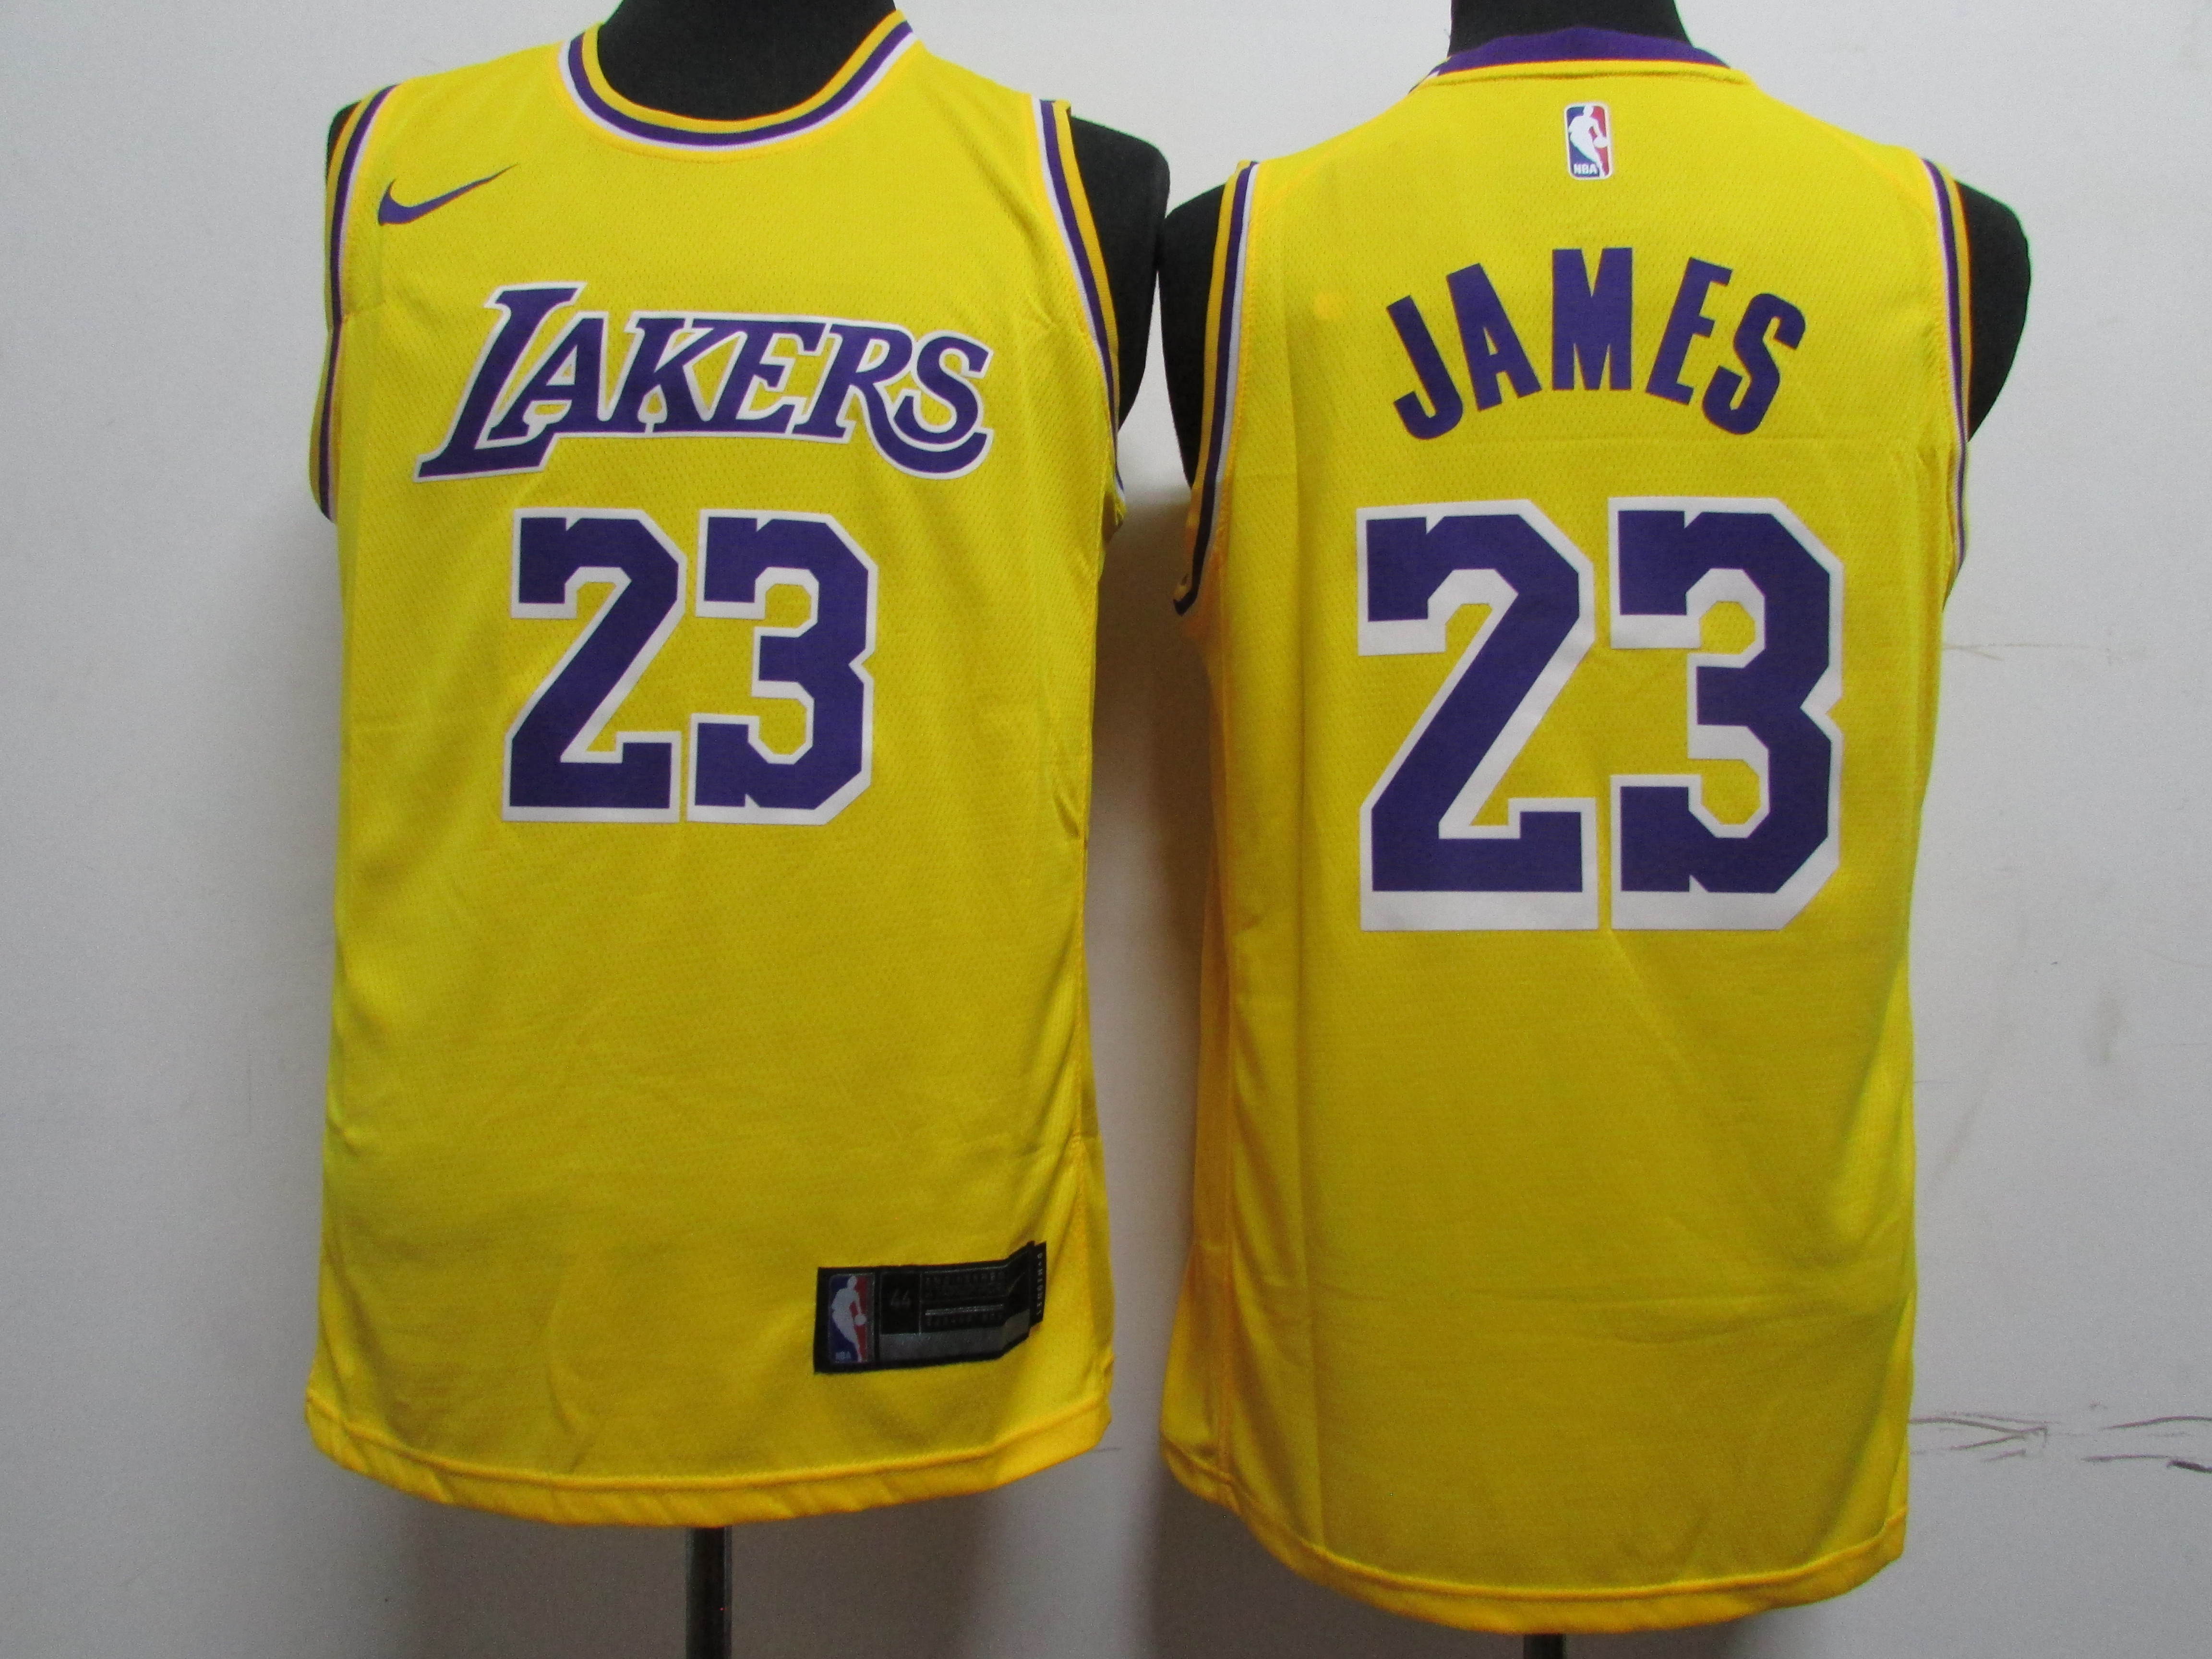 Lakers 23 Lebron James Yellow Printed Nike Swingman Jersey